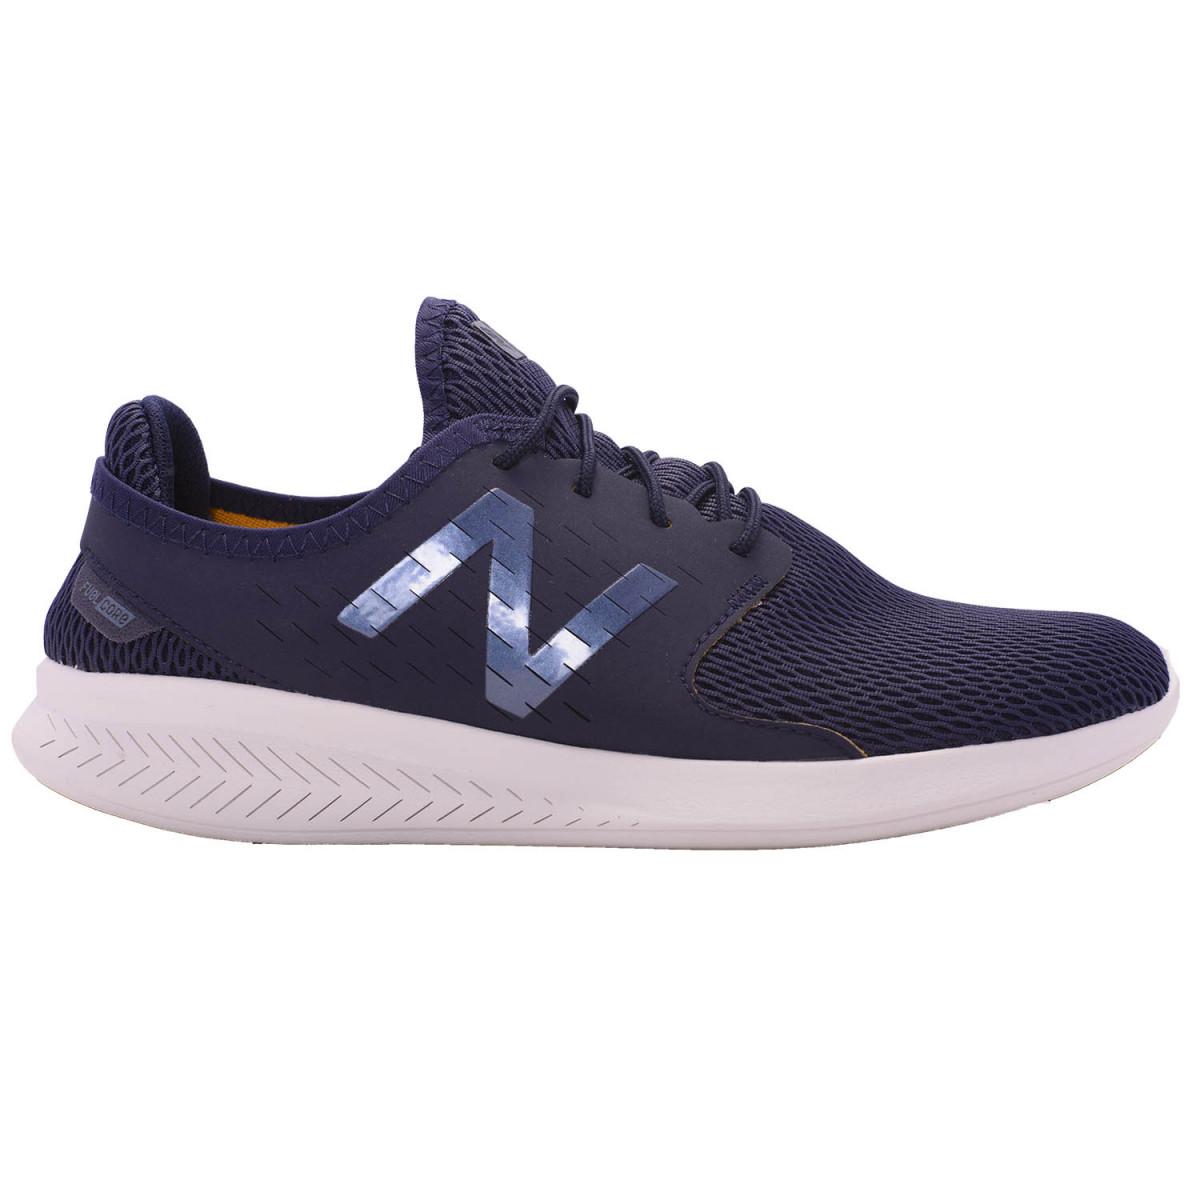 Zapatillas New Balance MCOASL3J